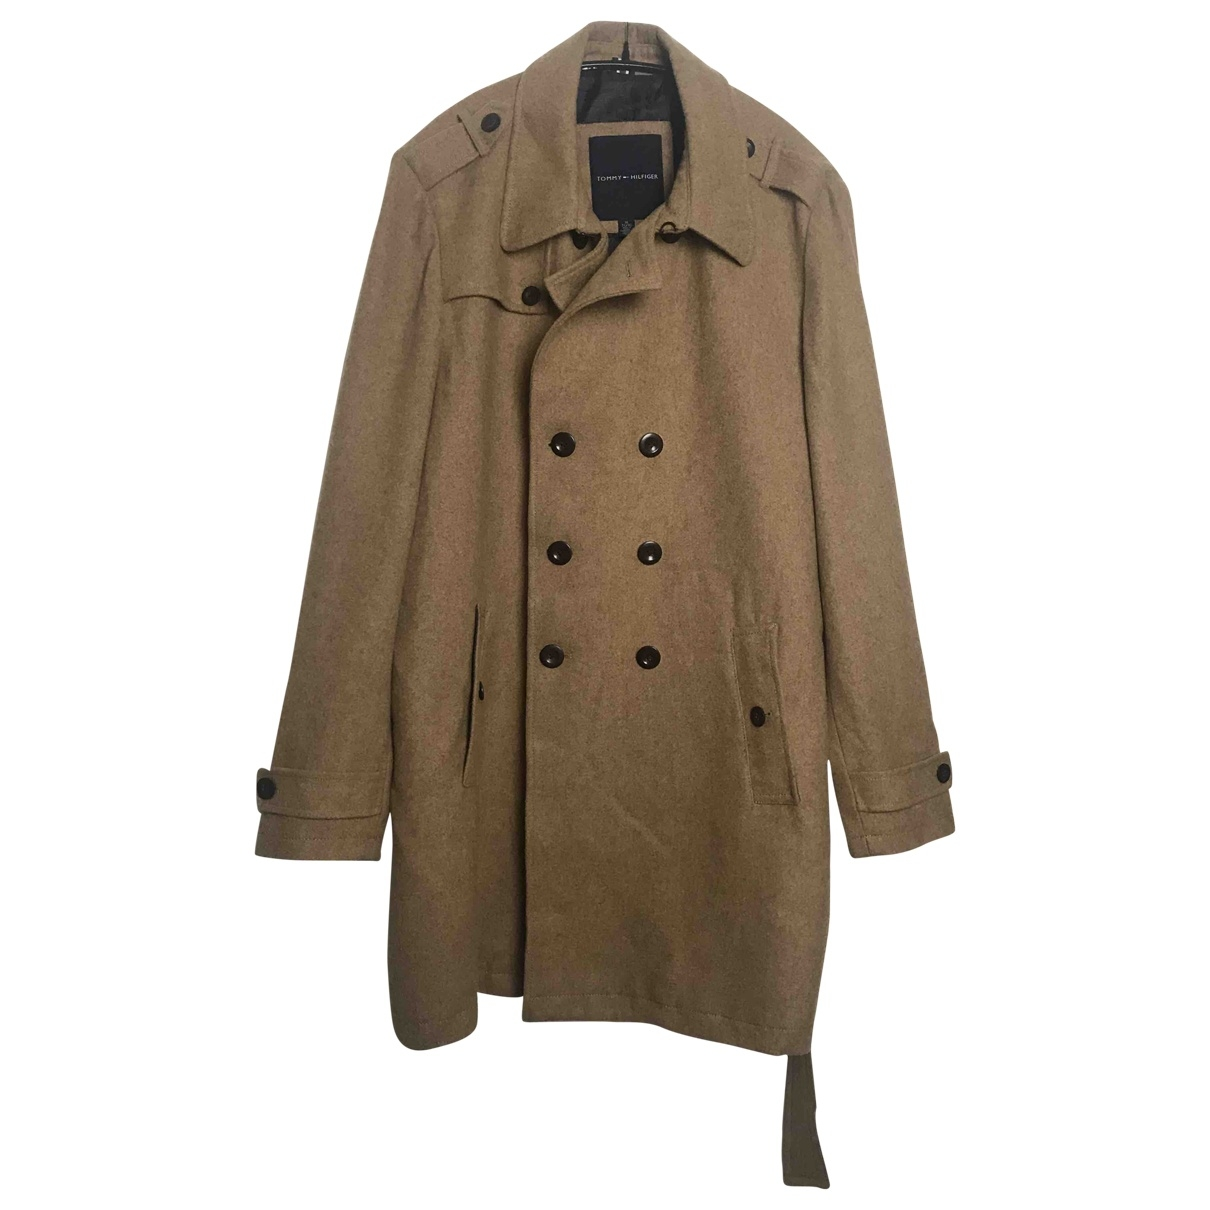 Tommy Hilfiger \N Beige Wool coat  for Men XL International